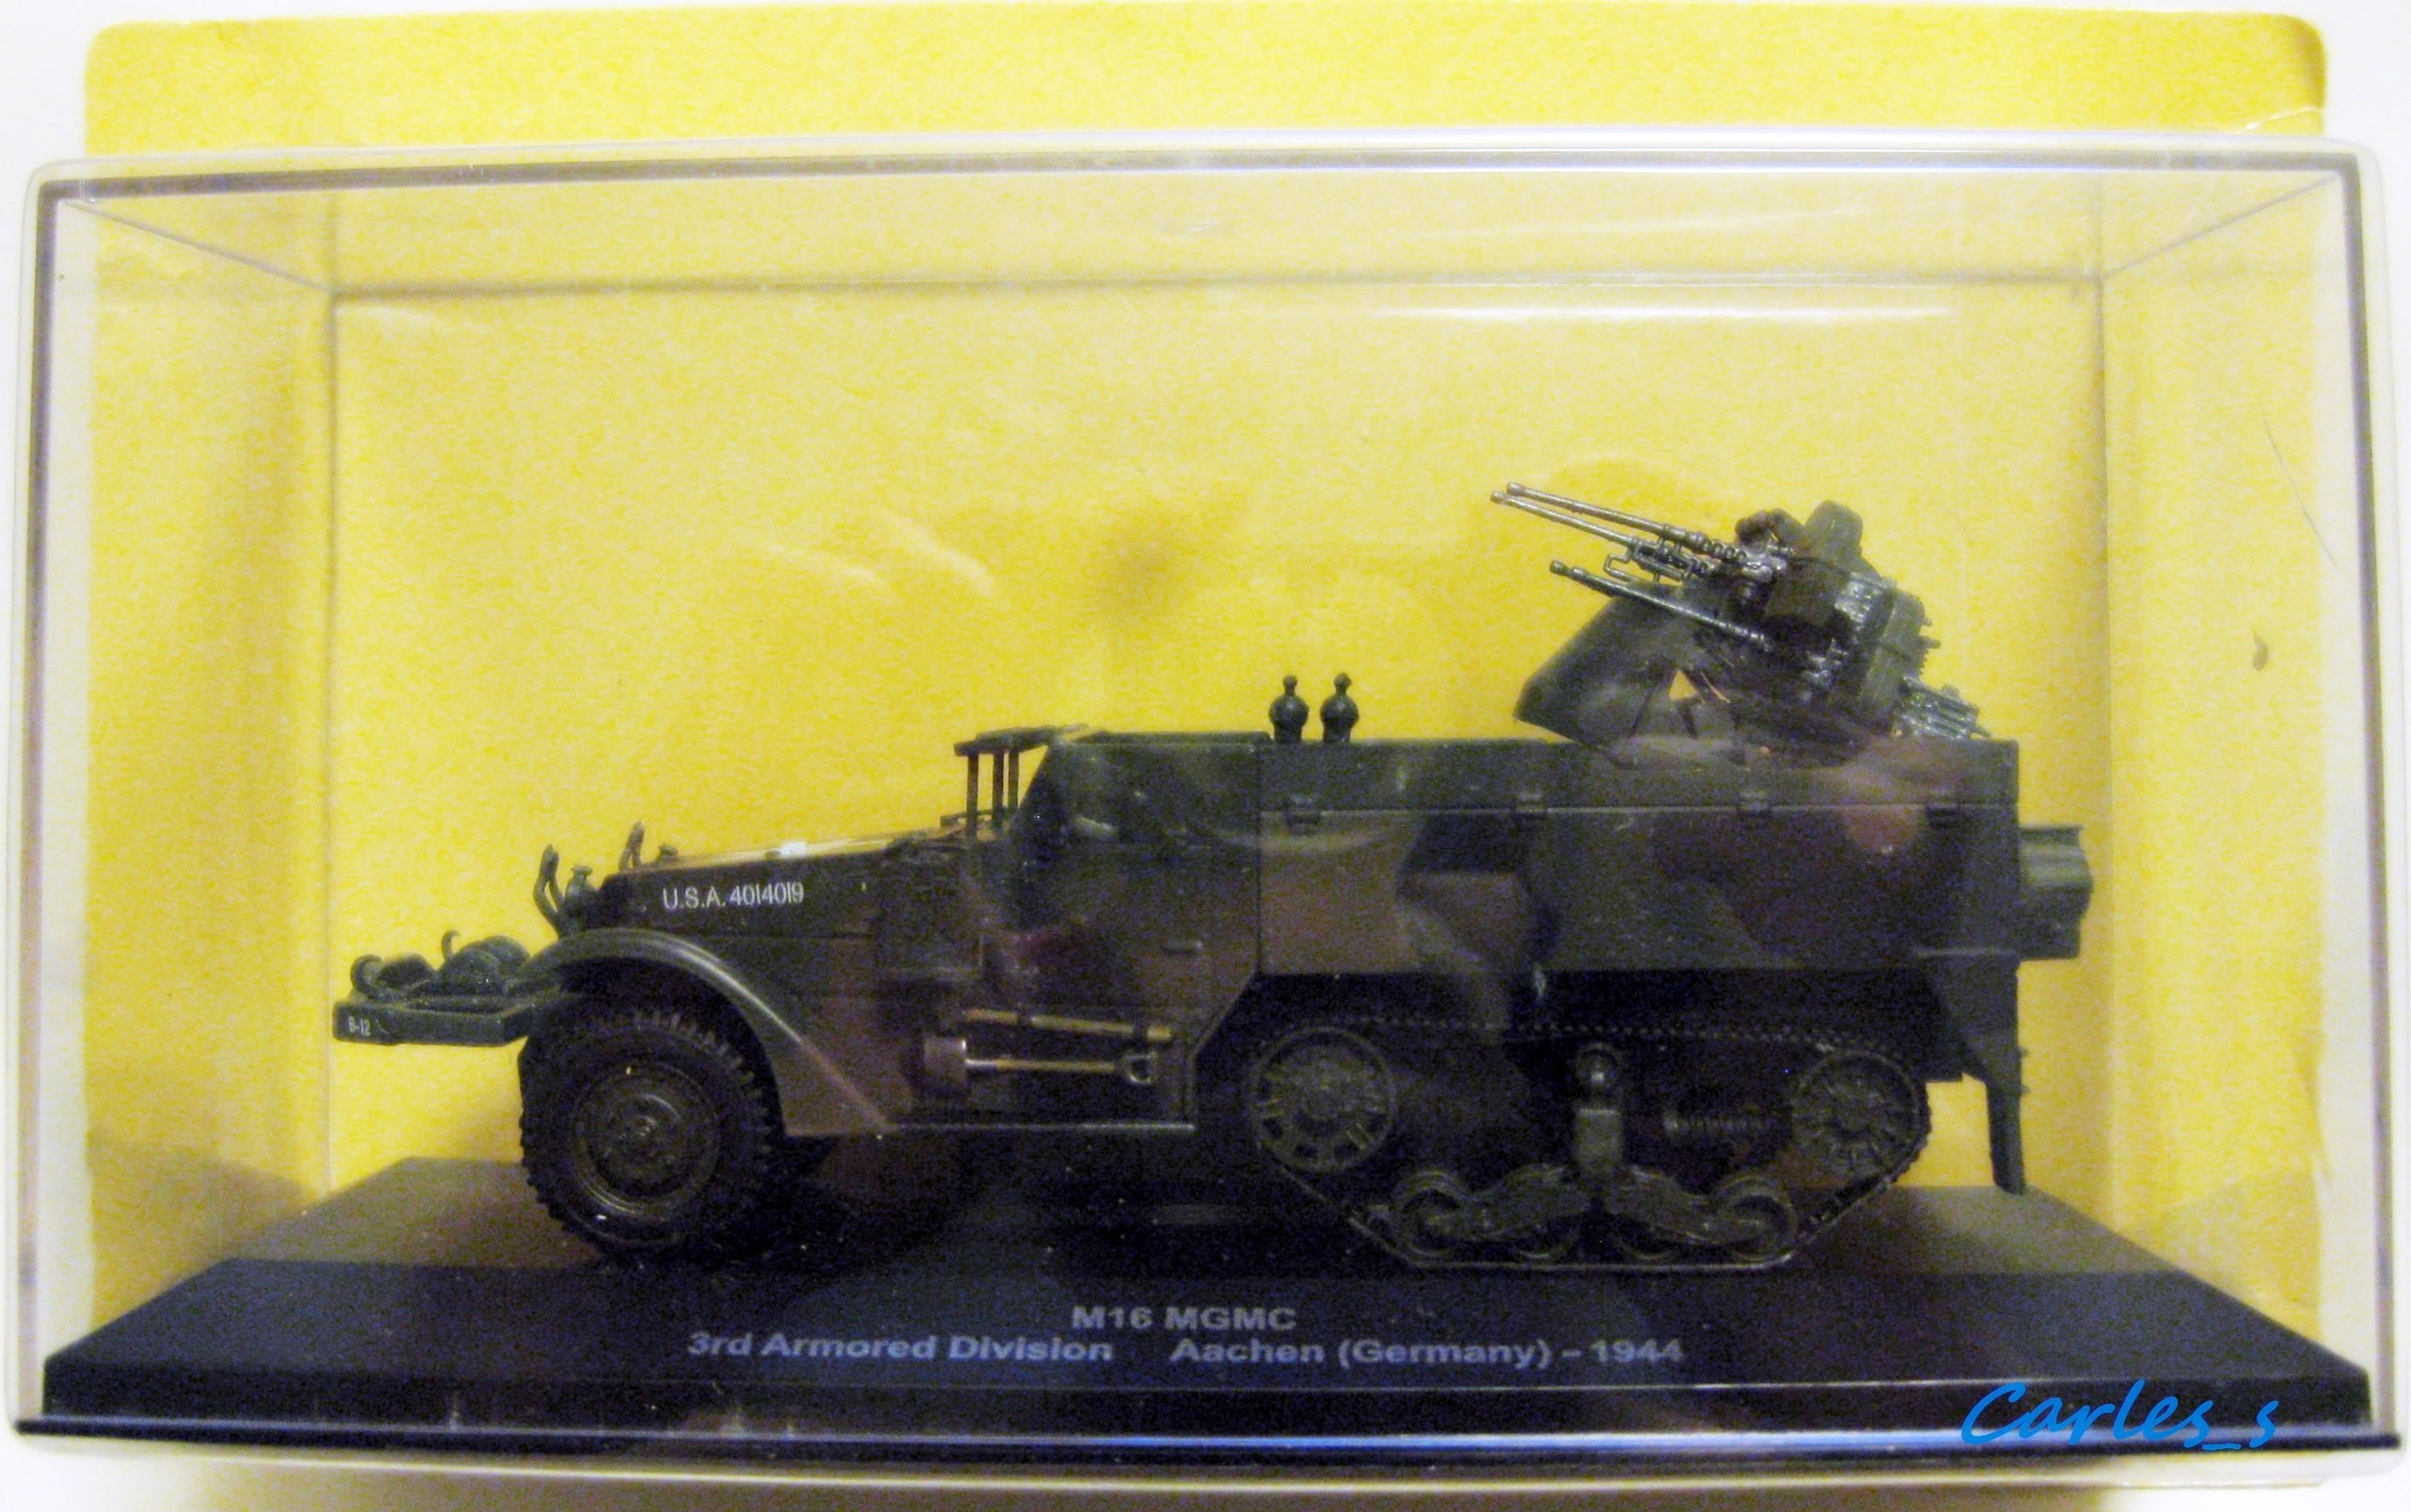 M16 MGMC Aachen (Germany) 1944 1/43 Eaglemoss - tank tanque char truck